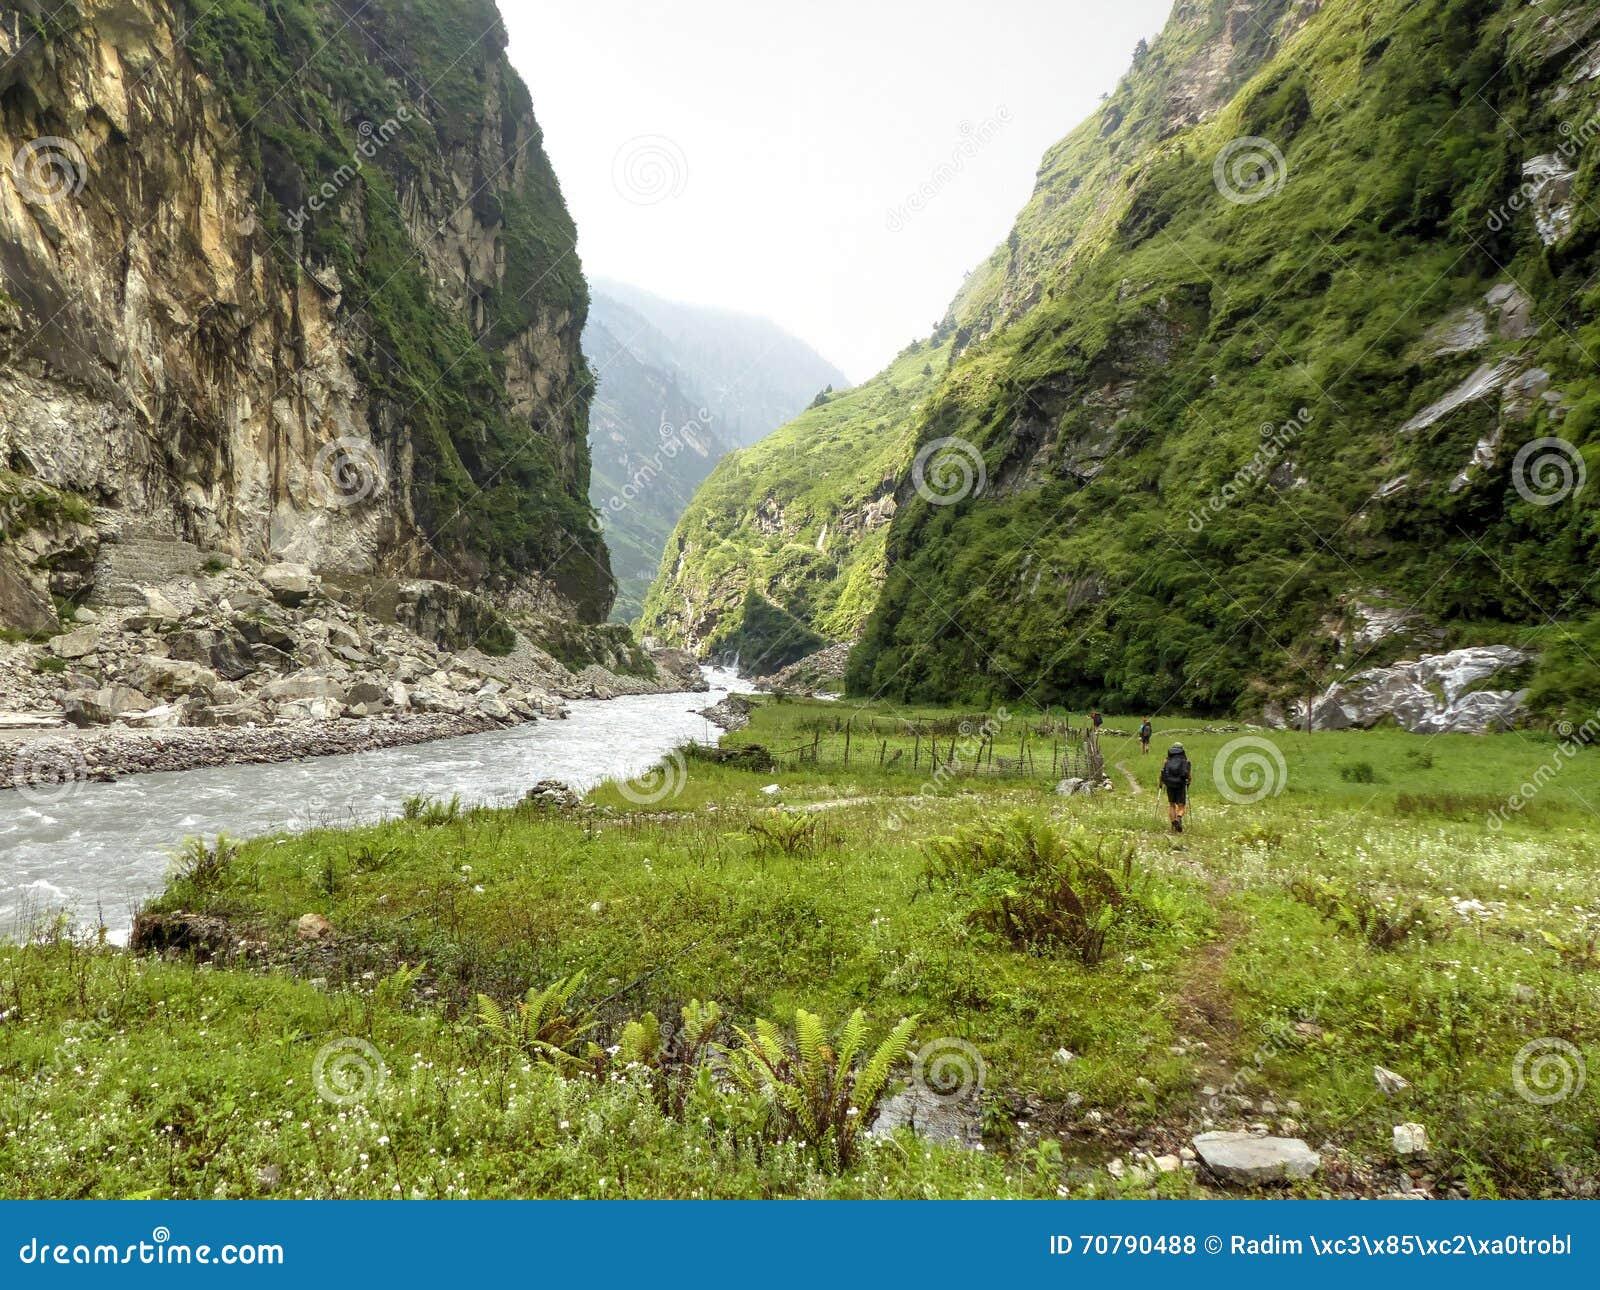 Path along a river Marsyangdi